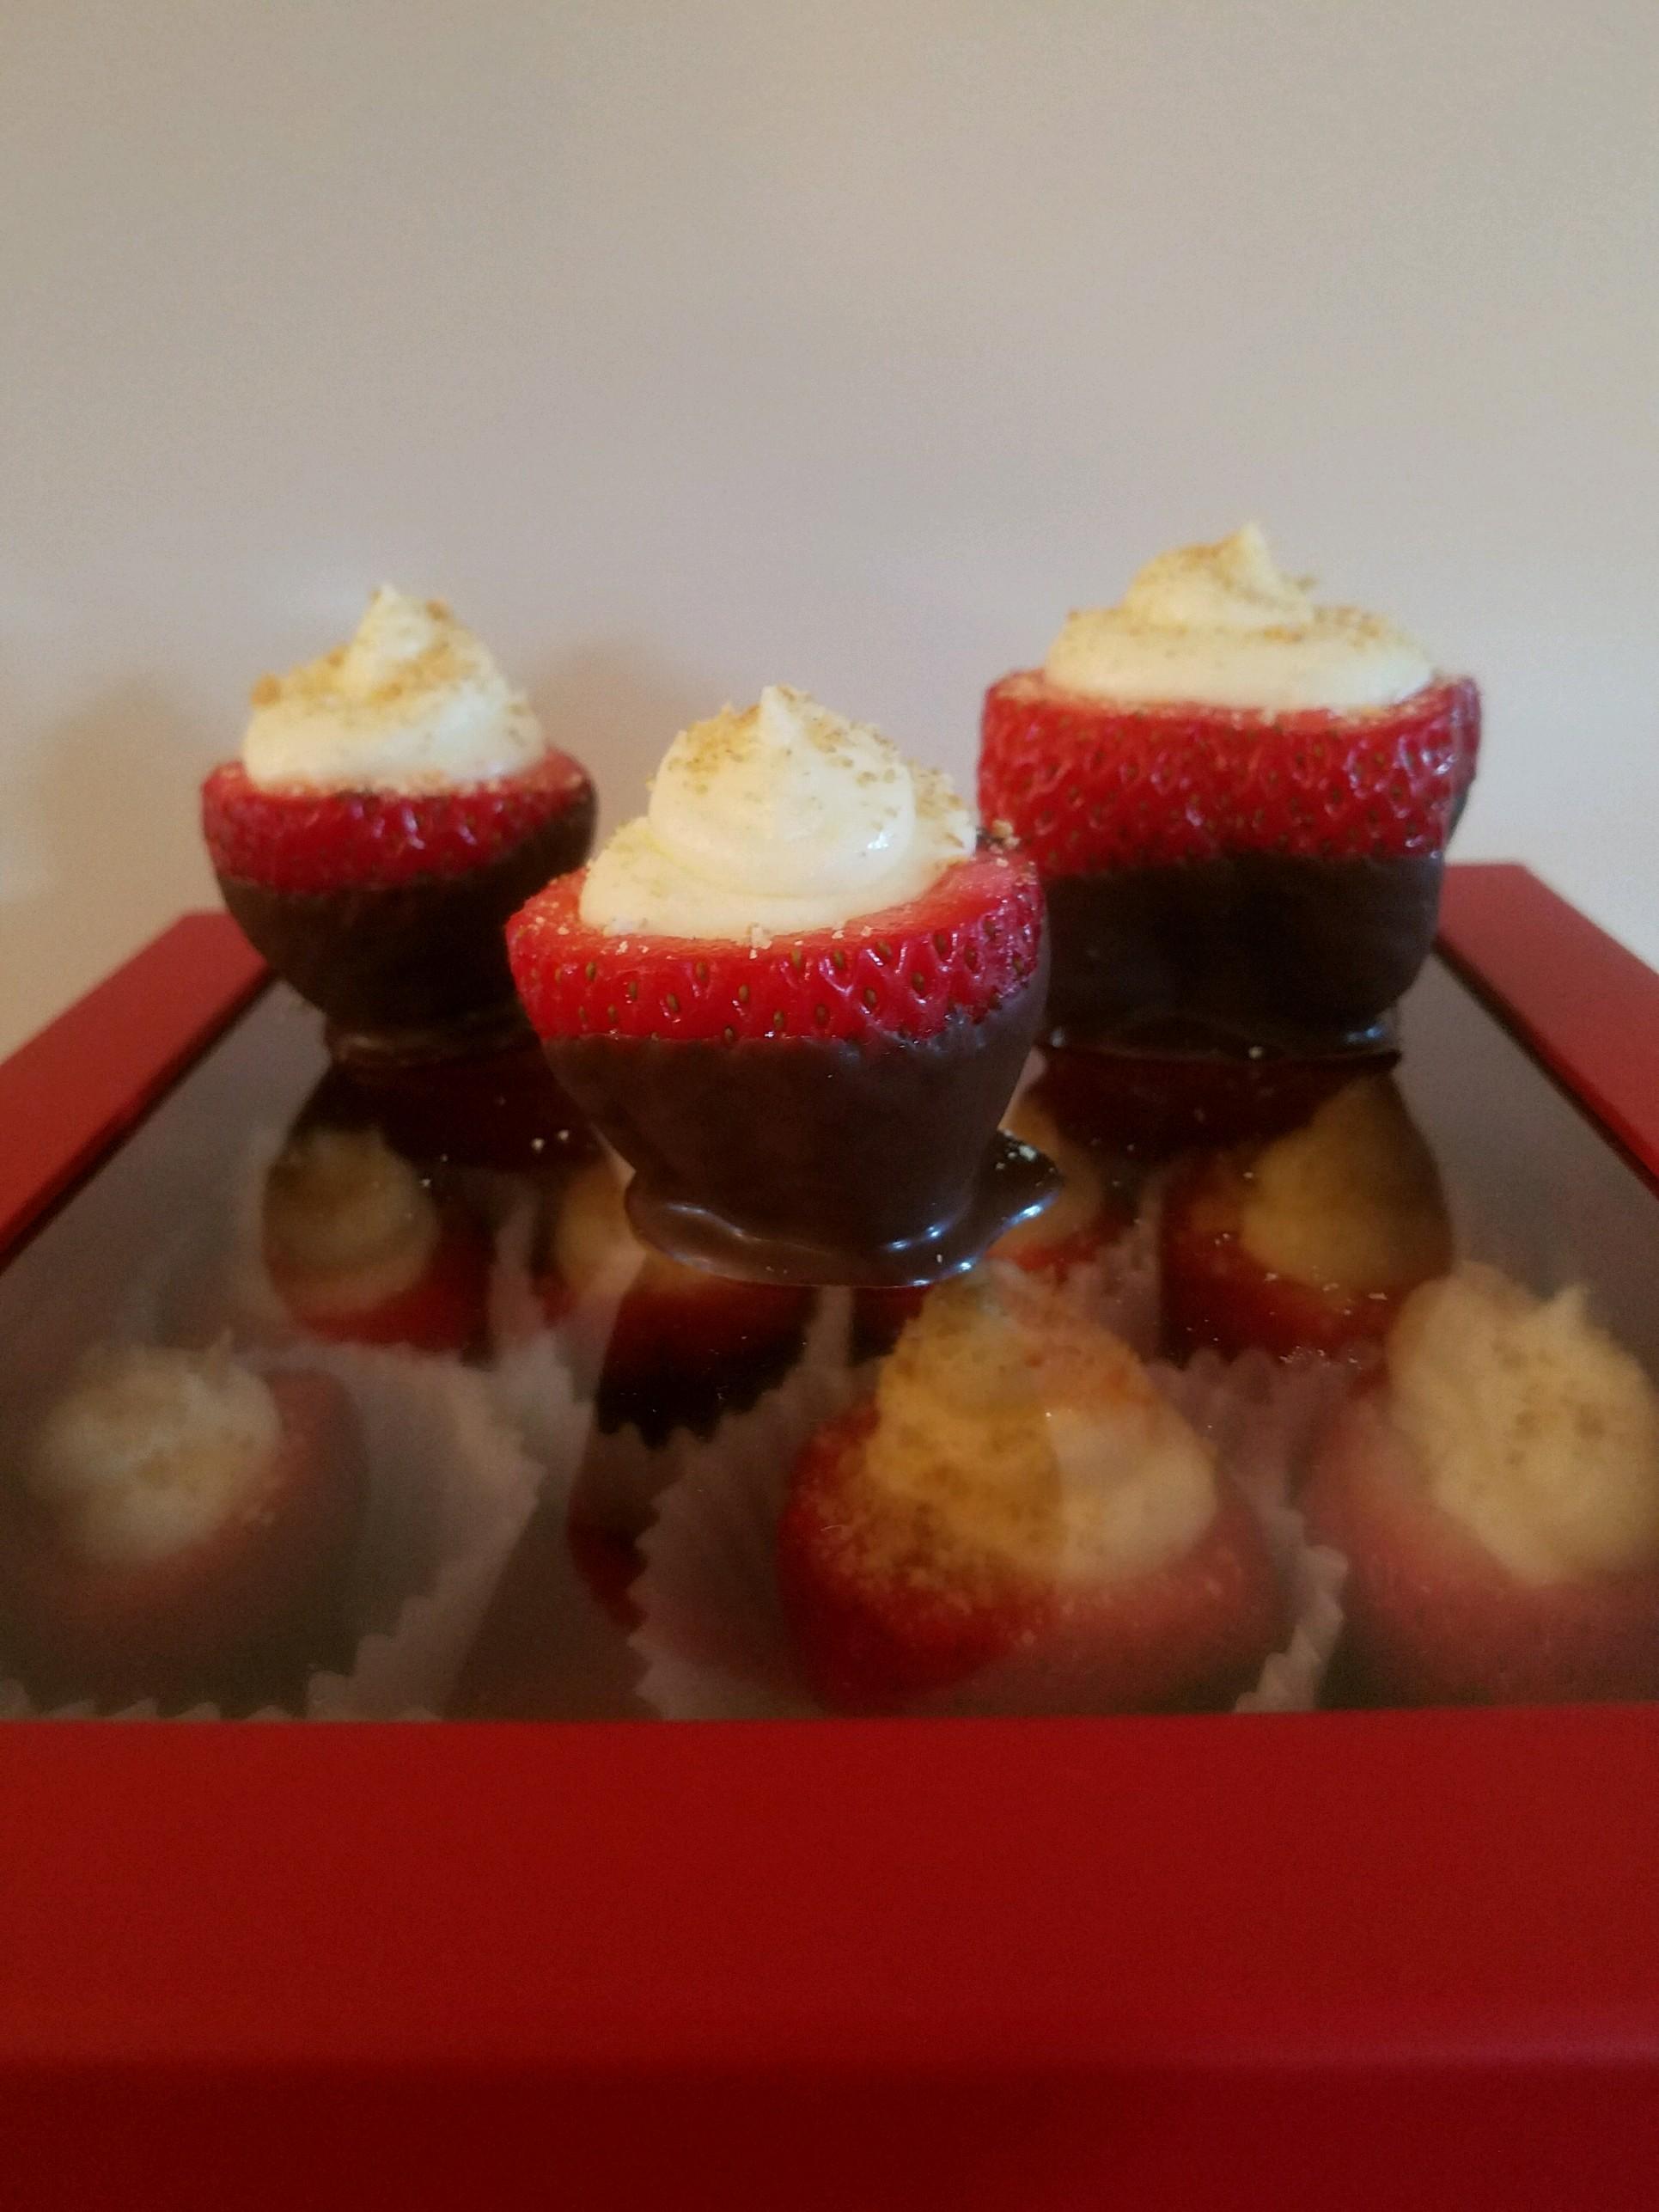 Berrylicious Cheesecake